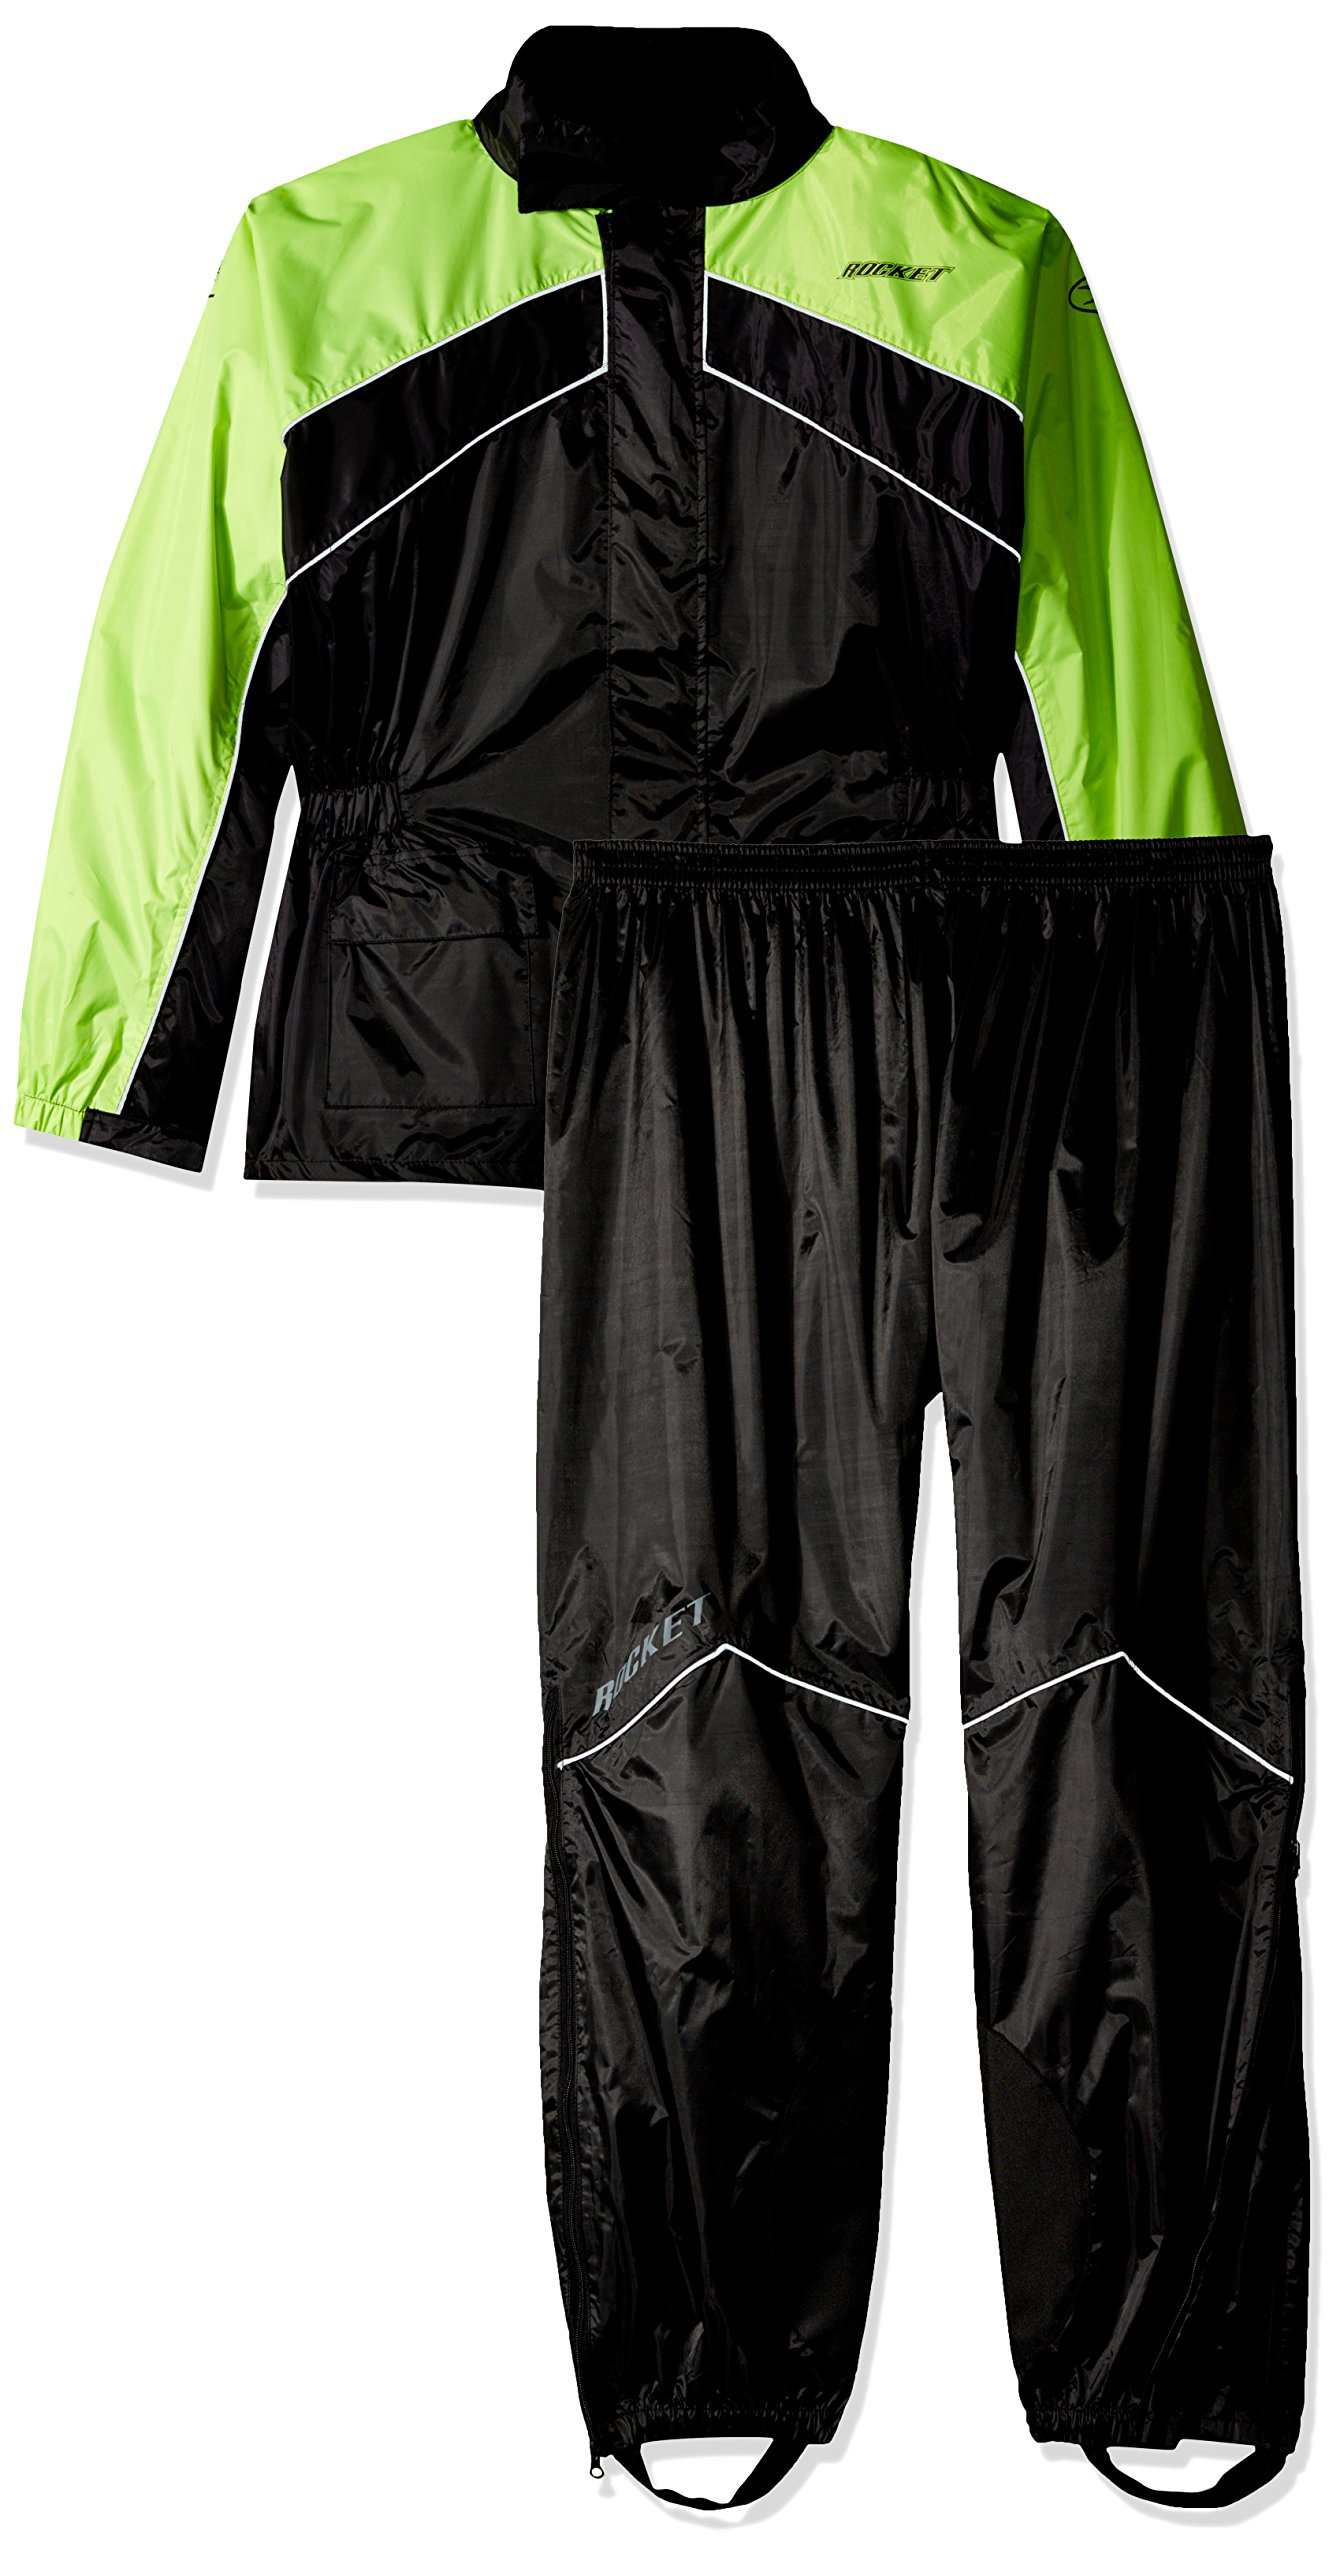 Joe Rocket RS-2 Men's Motorcycle Rain Suit (Black/Hi-Viz, Medium)